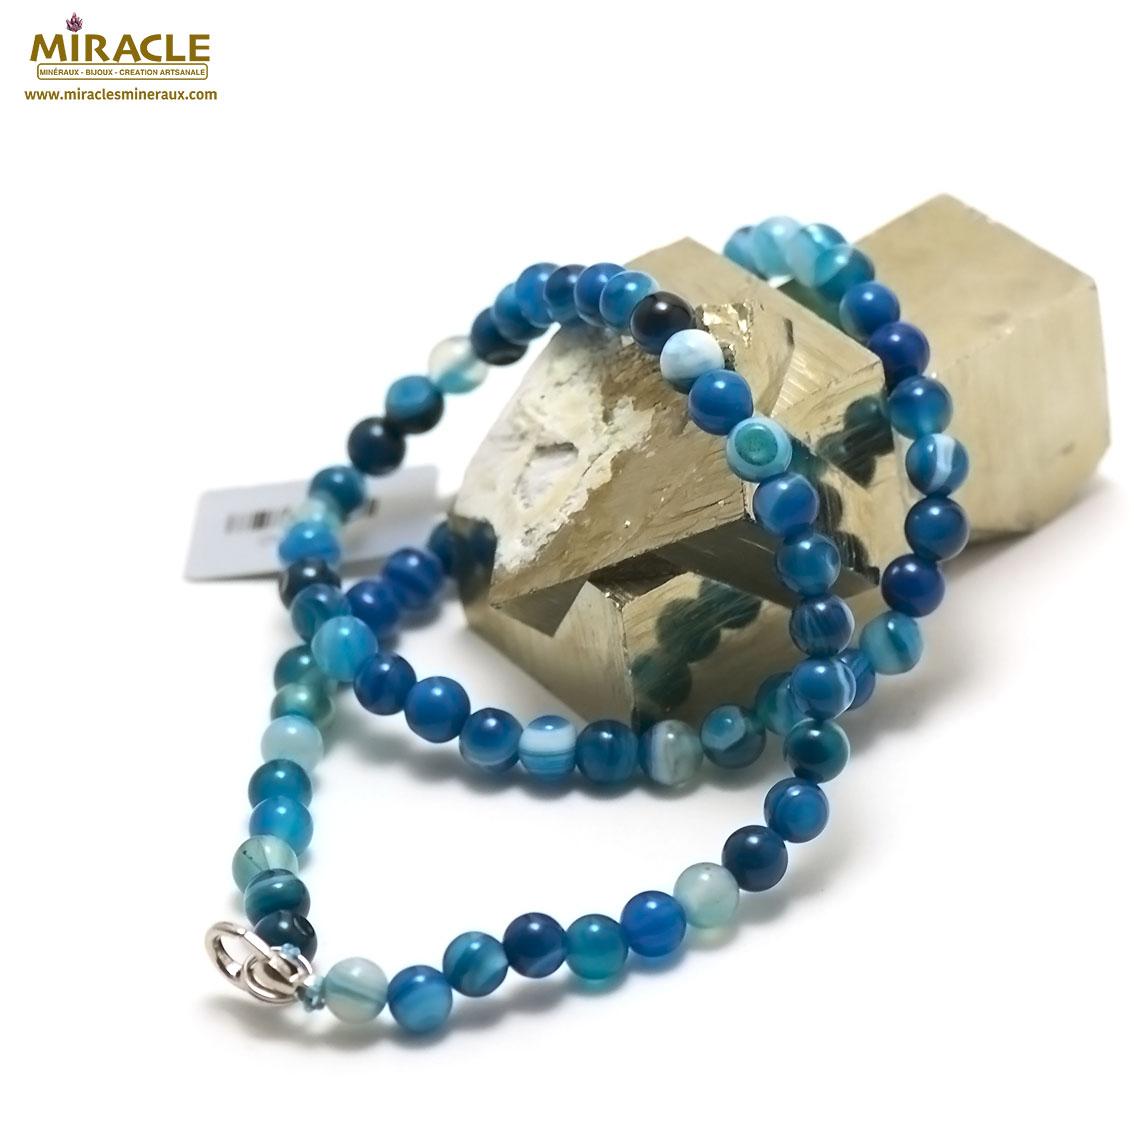 collier agate teinté bleu ronde 6 mm